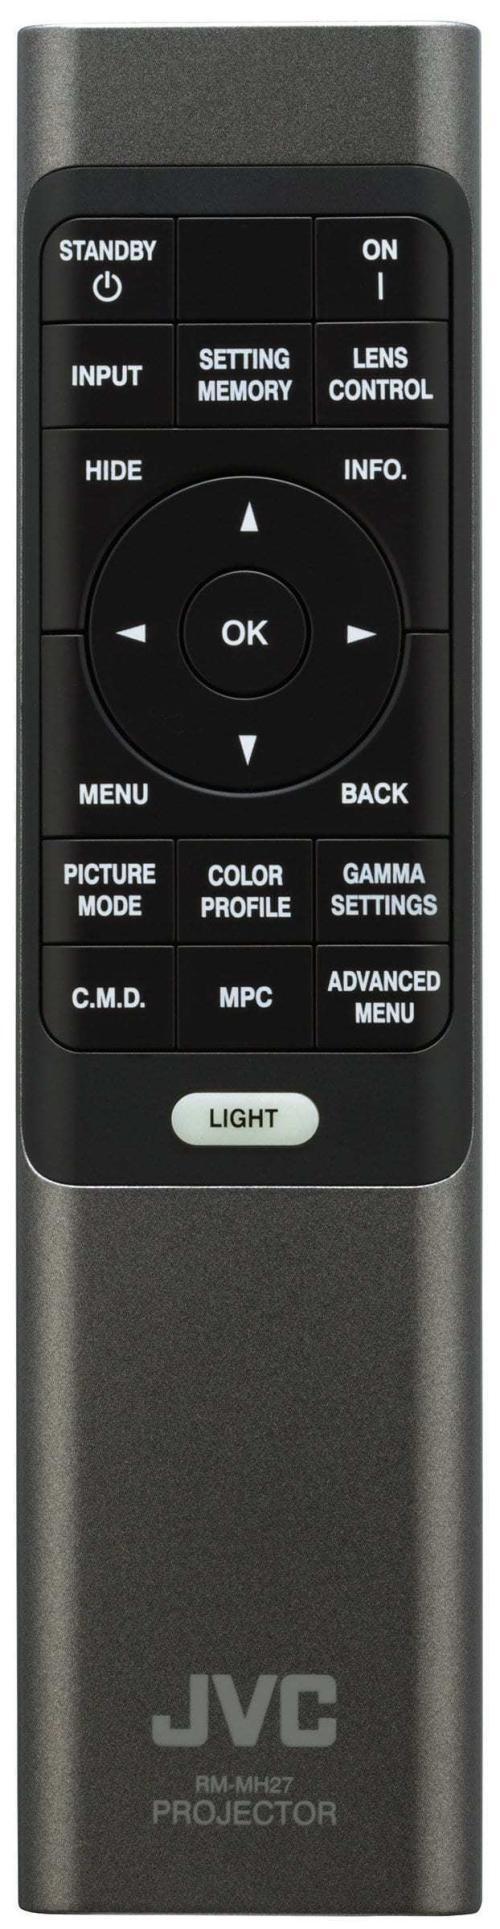 JVC DLA-N7 4K D-ILA HDR